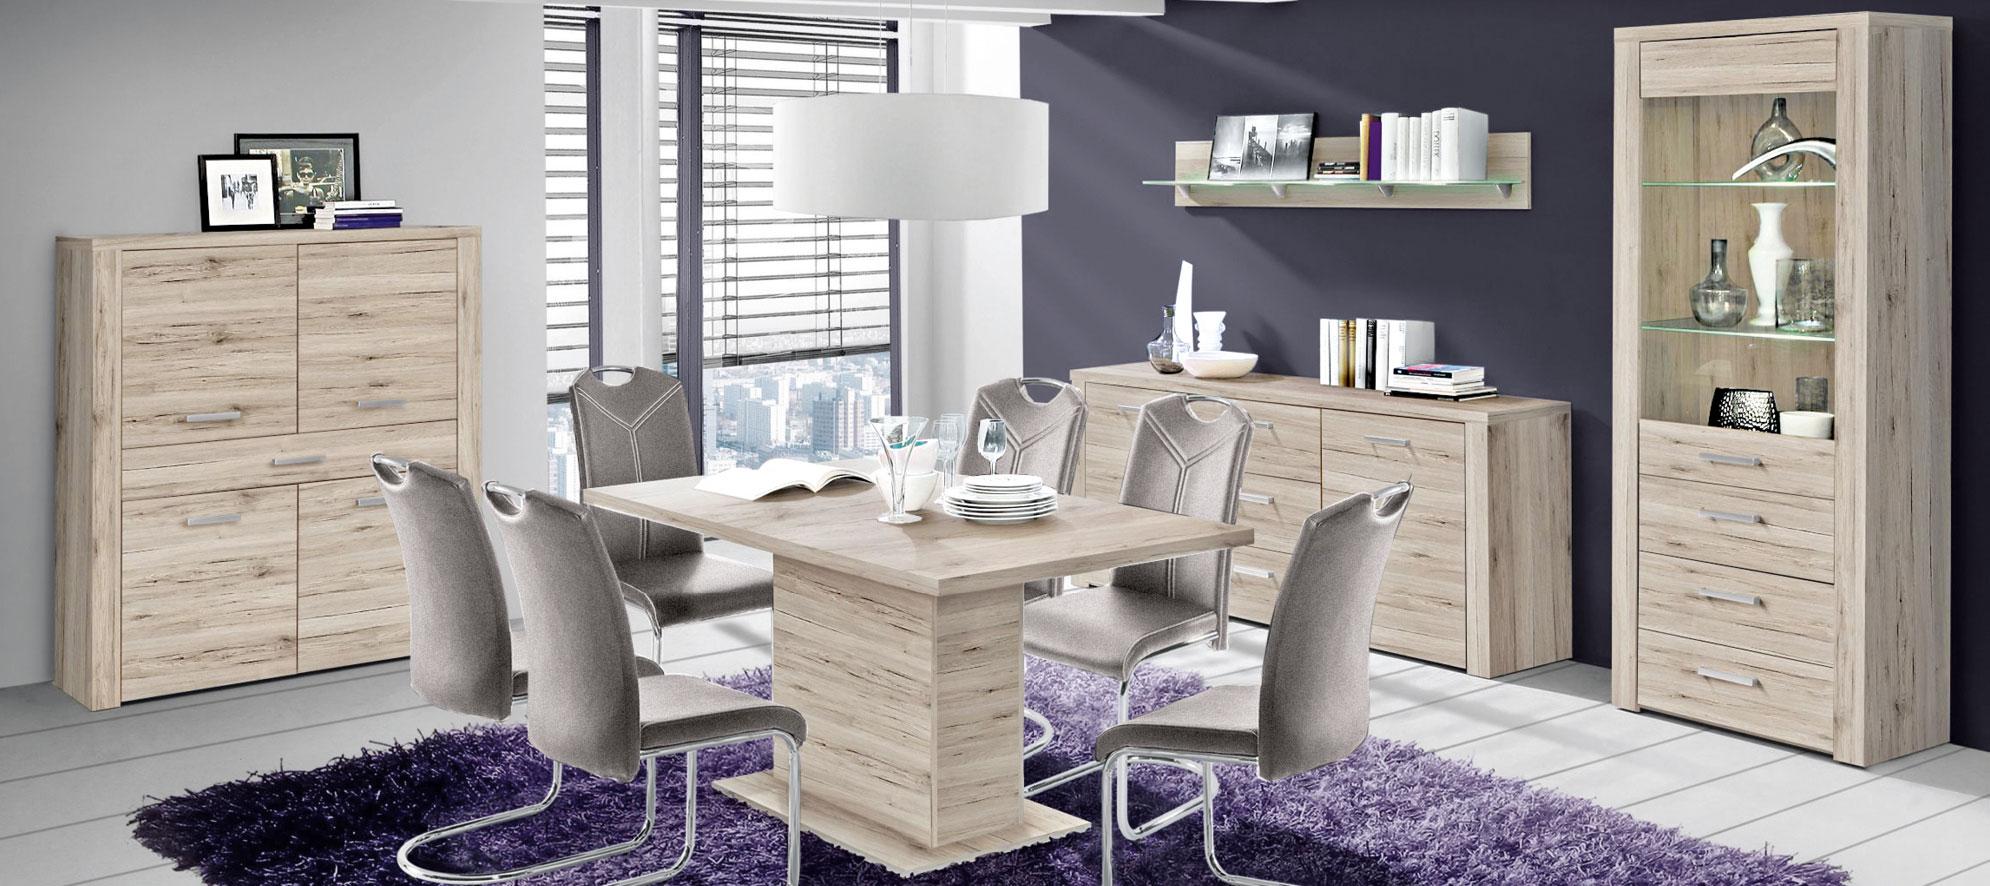 rolli sb m belmarkt in elz limburg m bel k chen gut g nstig. Black Bedroom Furniture Sets. Home Design Ideas